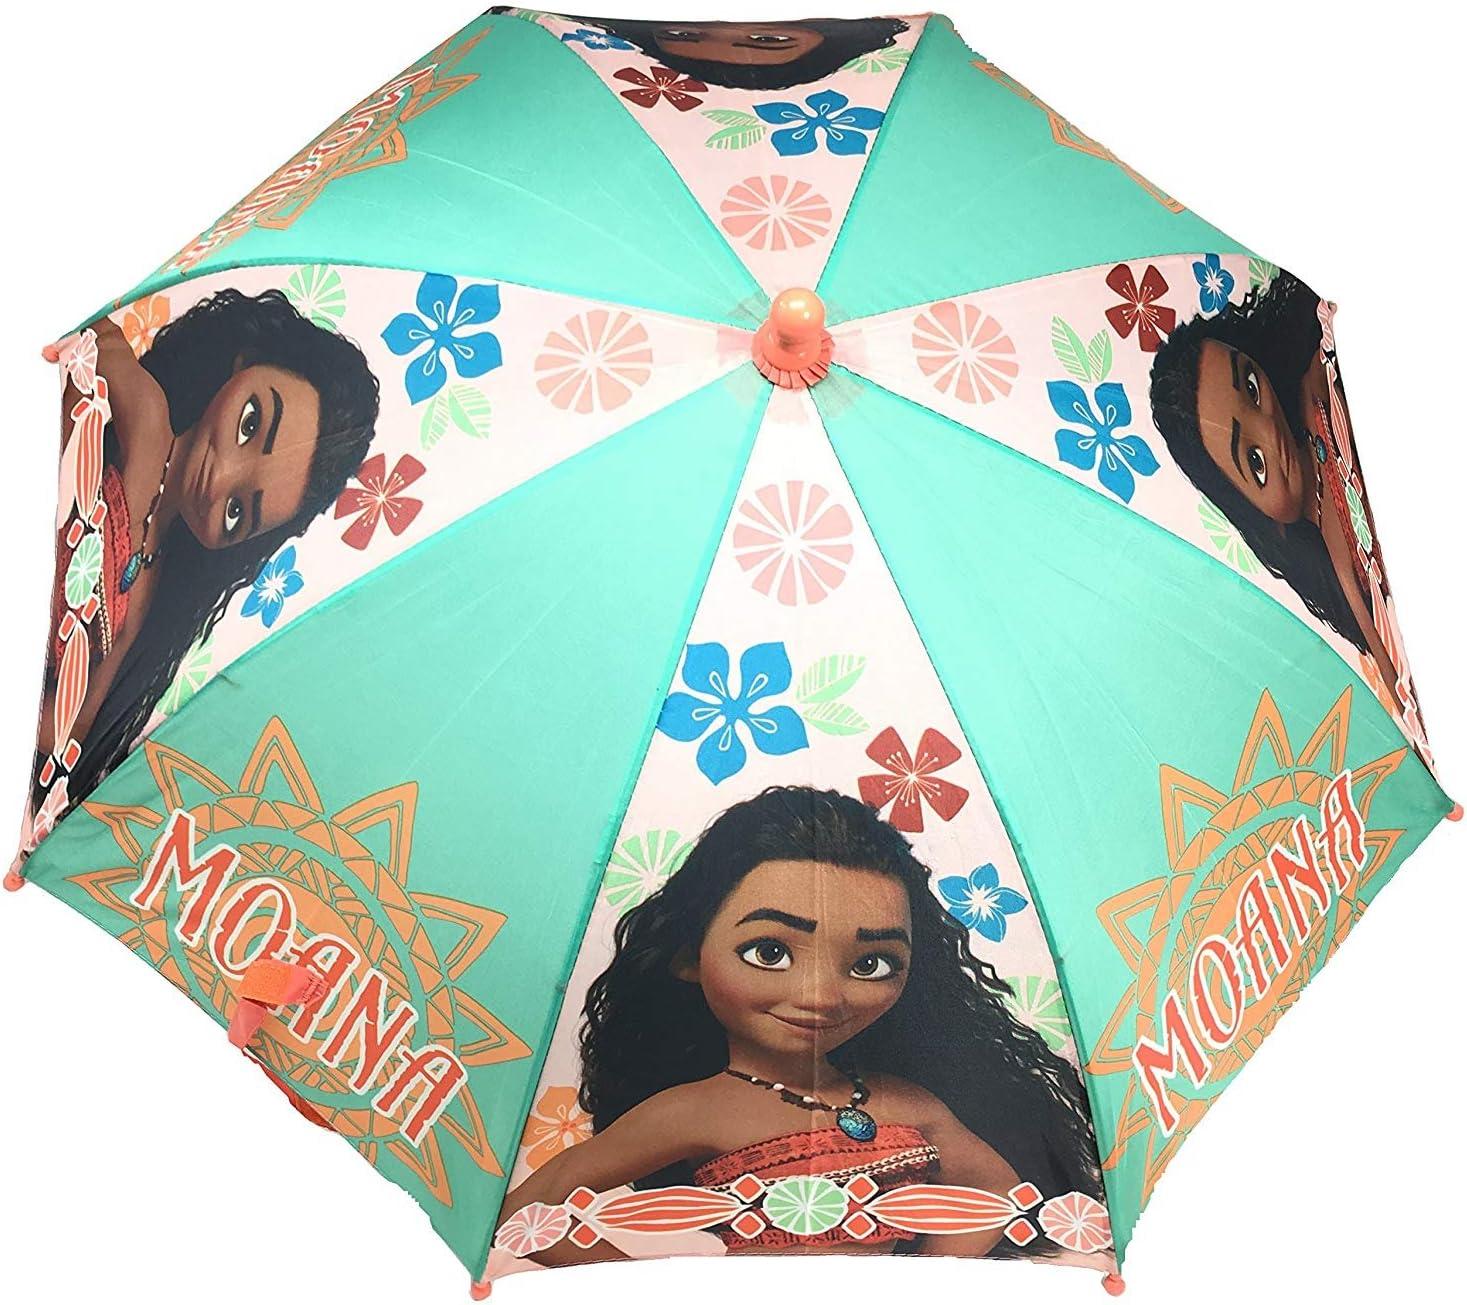 Disney Moana Summer Umbrella Child Size For Girls OAR87731-ST